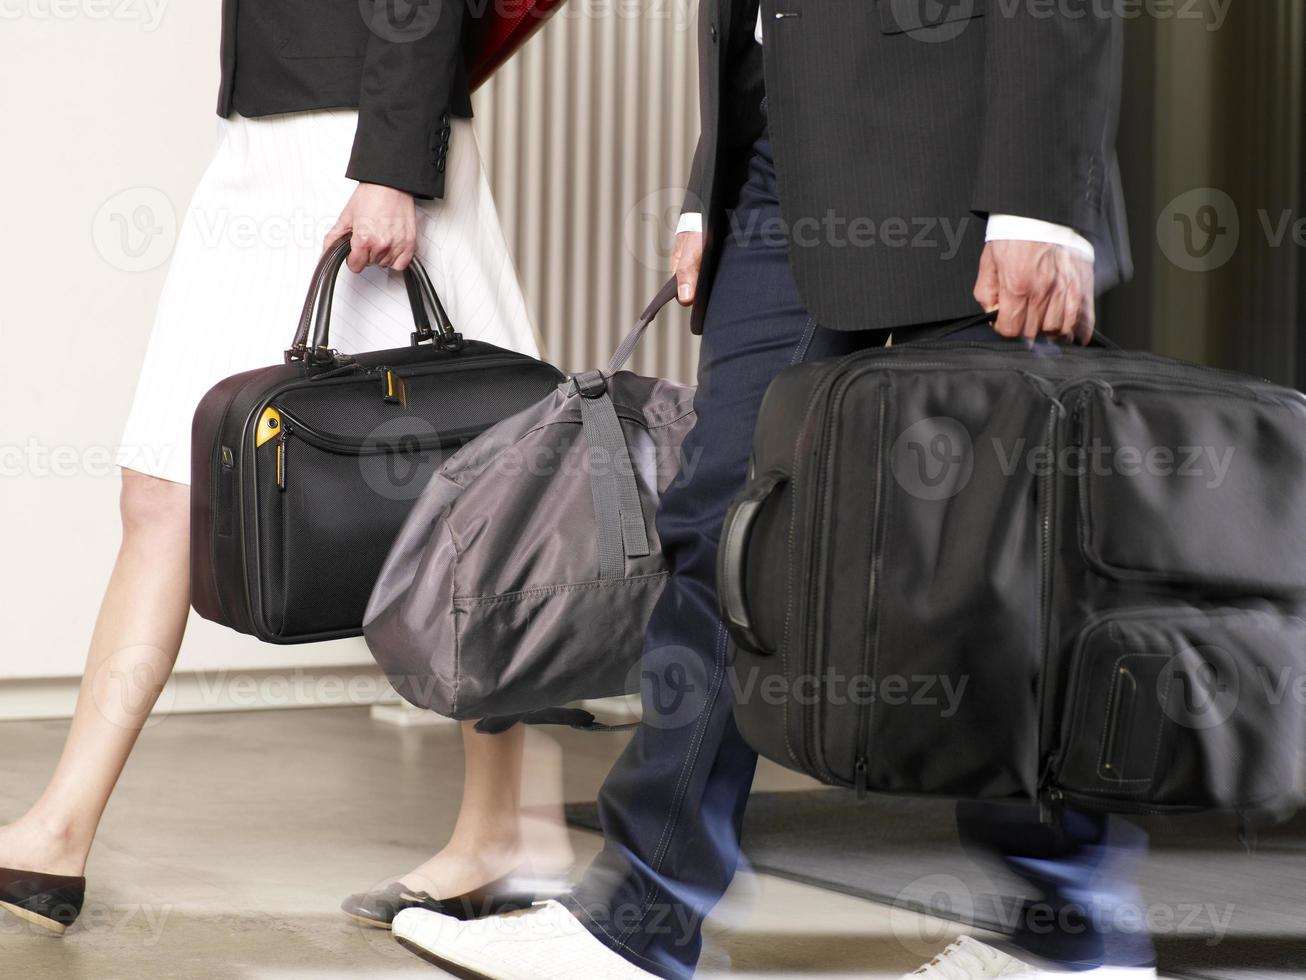 koppel met hun bagage in een hotel. foto